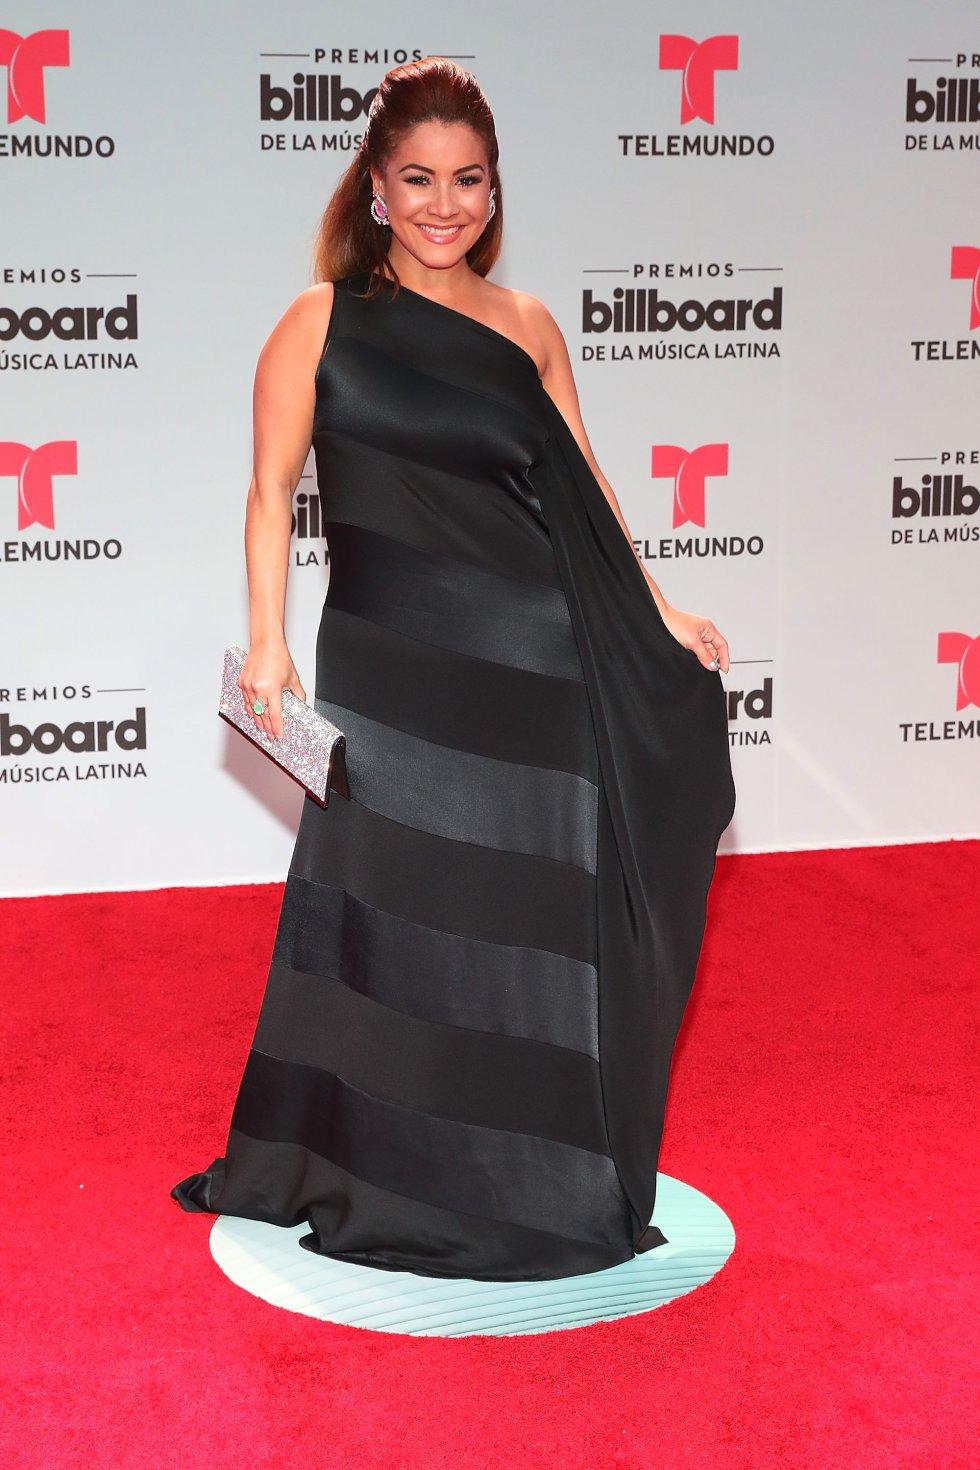 Carolina Sandoval presentadora venezolana.